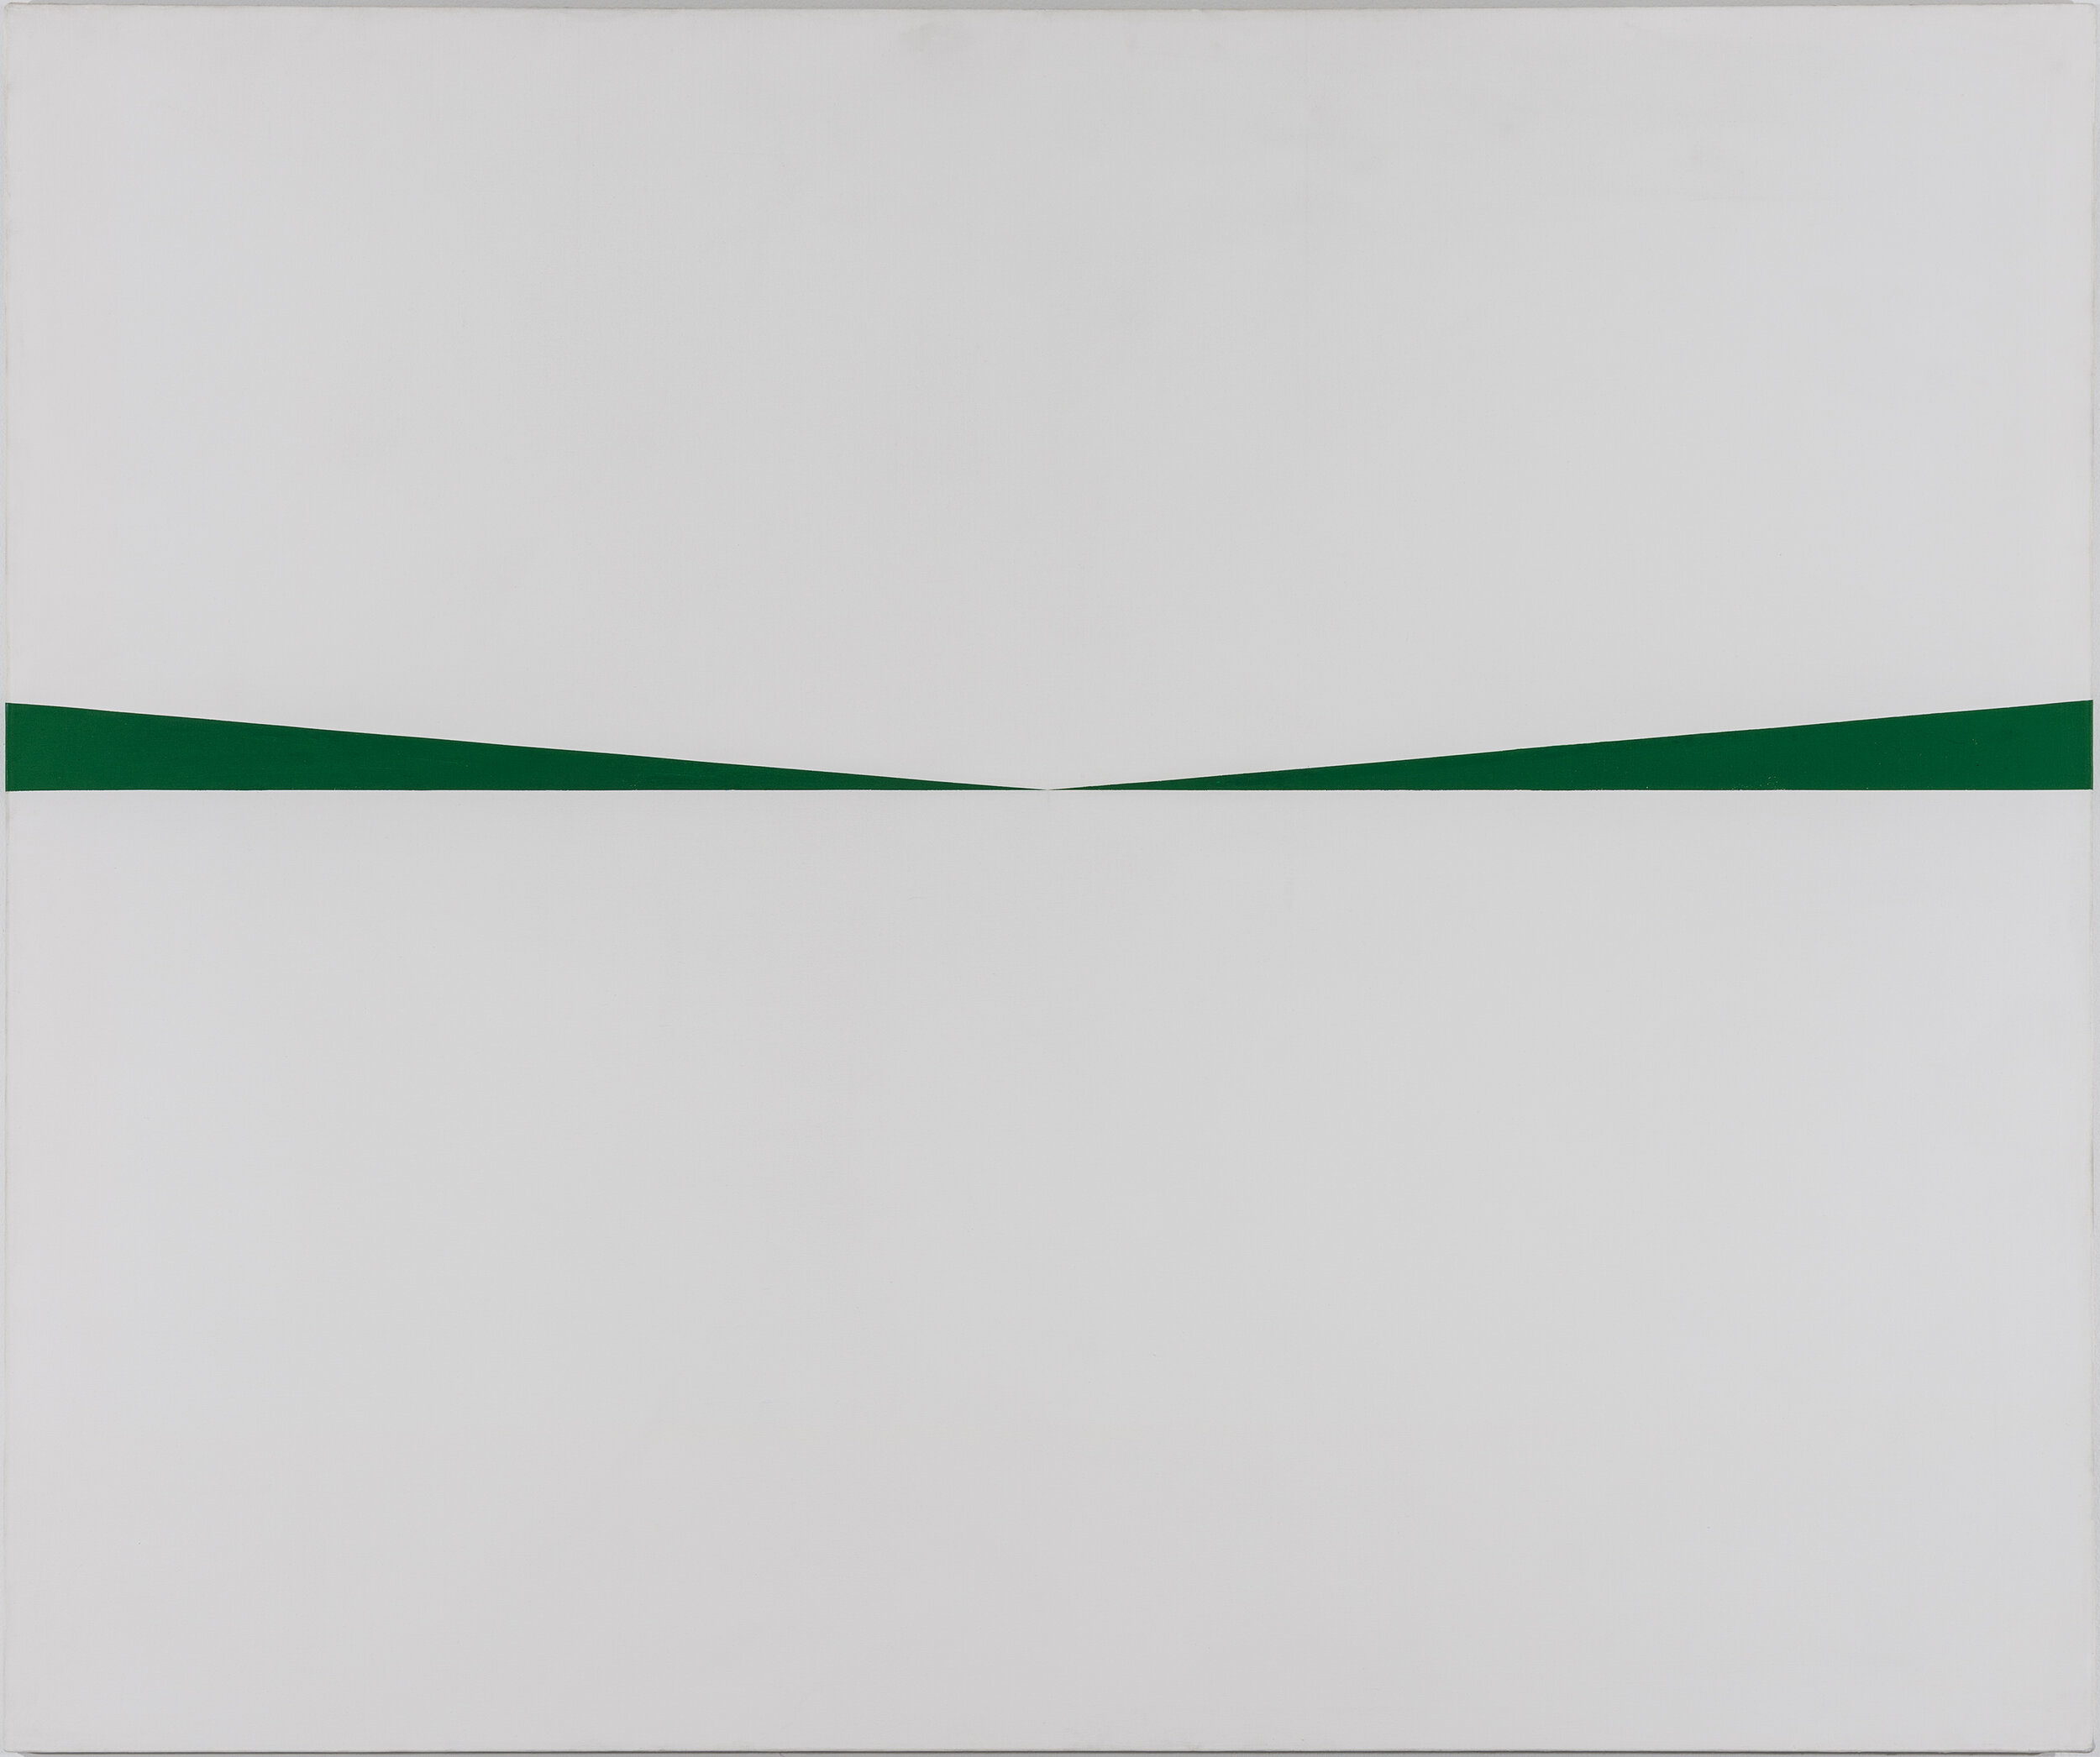 Carmen Herrara's Blanco y Verde, part of the Museum of Fine Arts 19th amendment exhibition, Women Take the Floor.